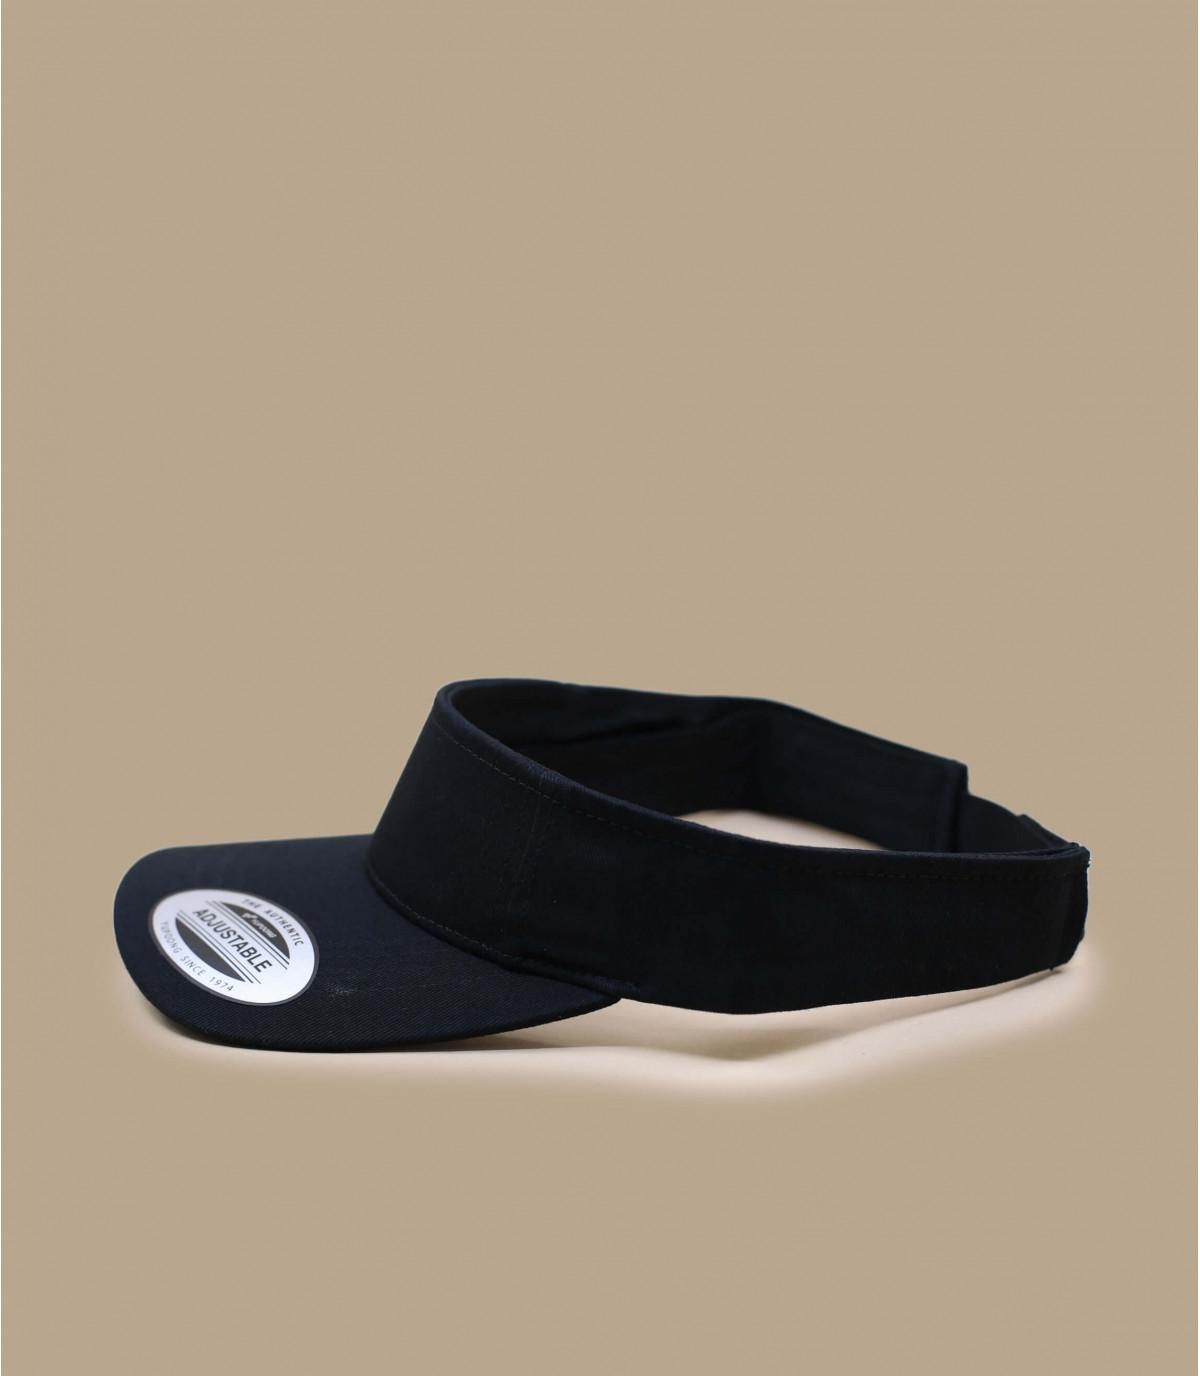 Black visor wm